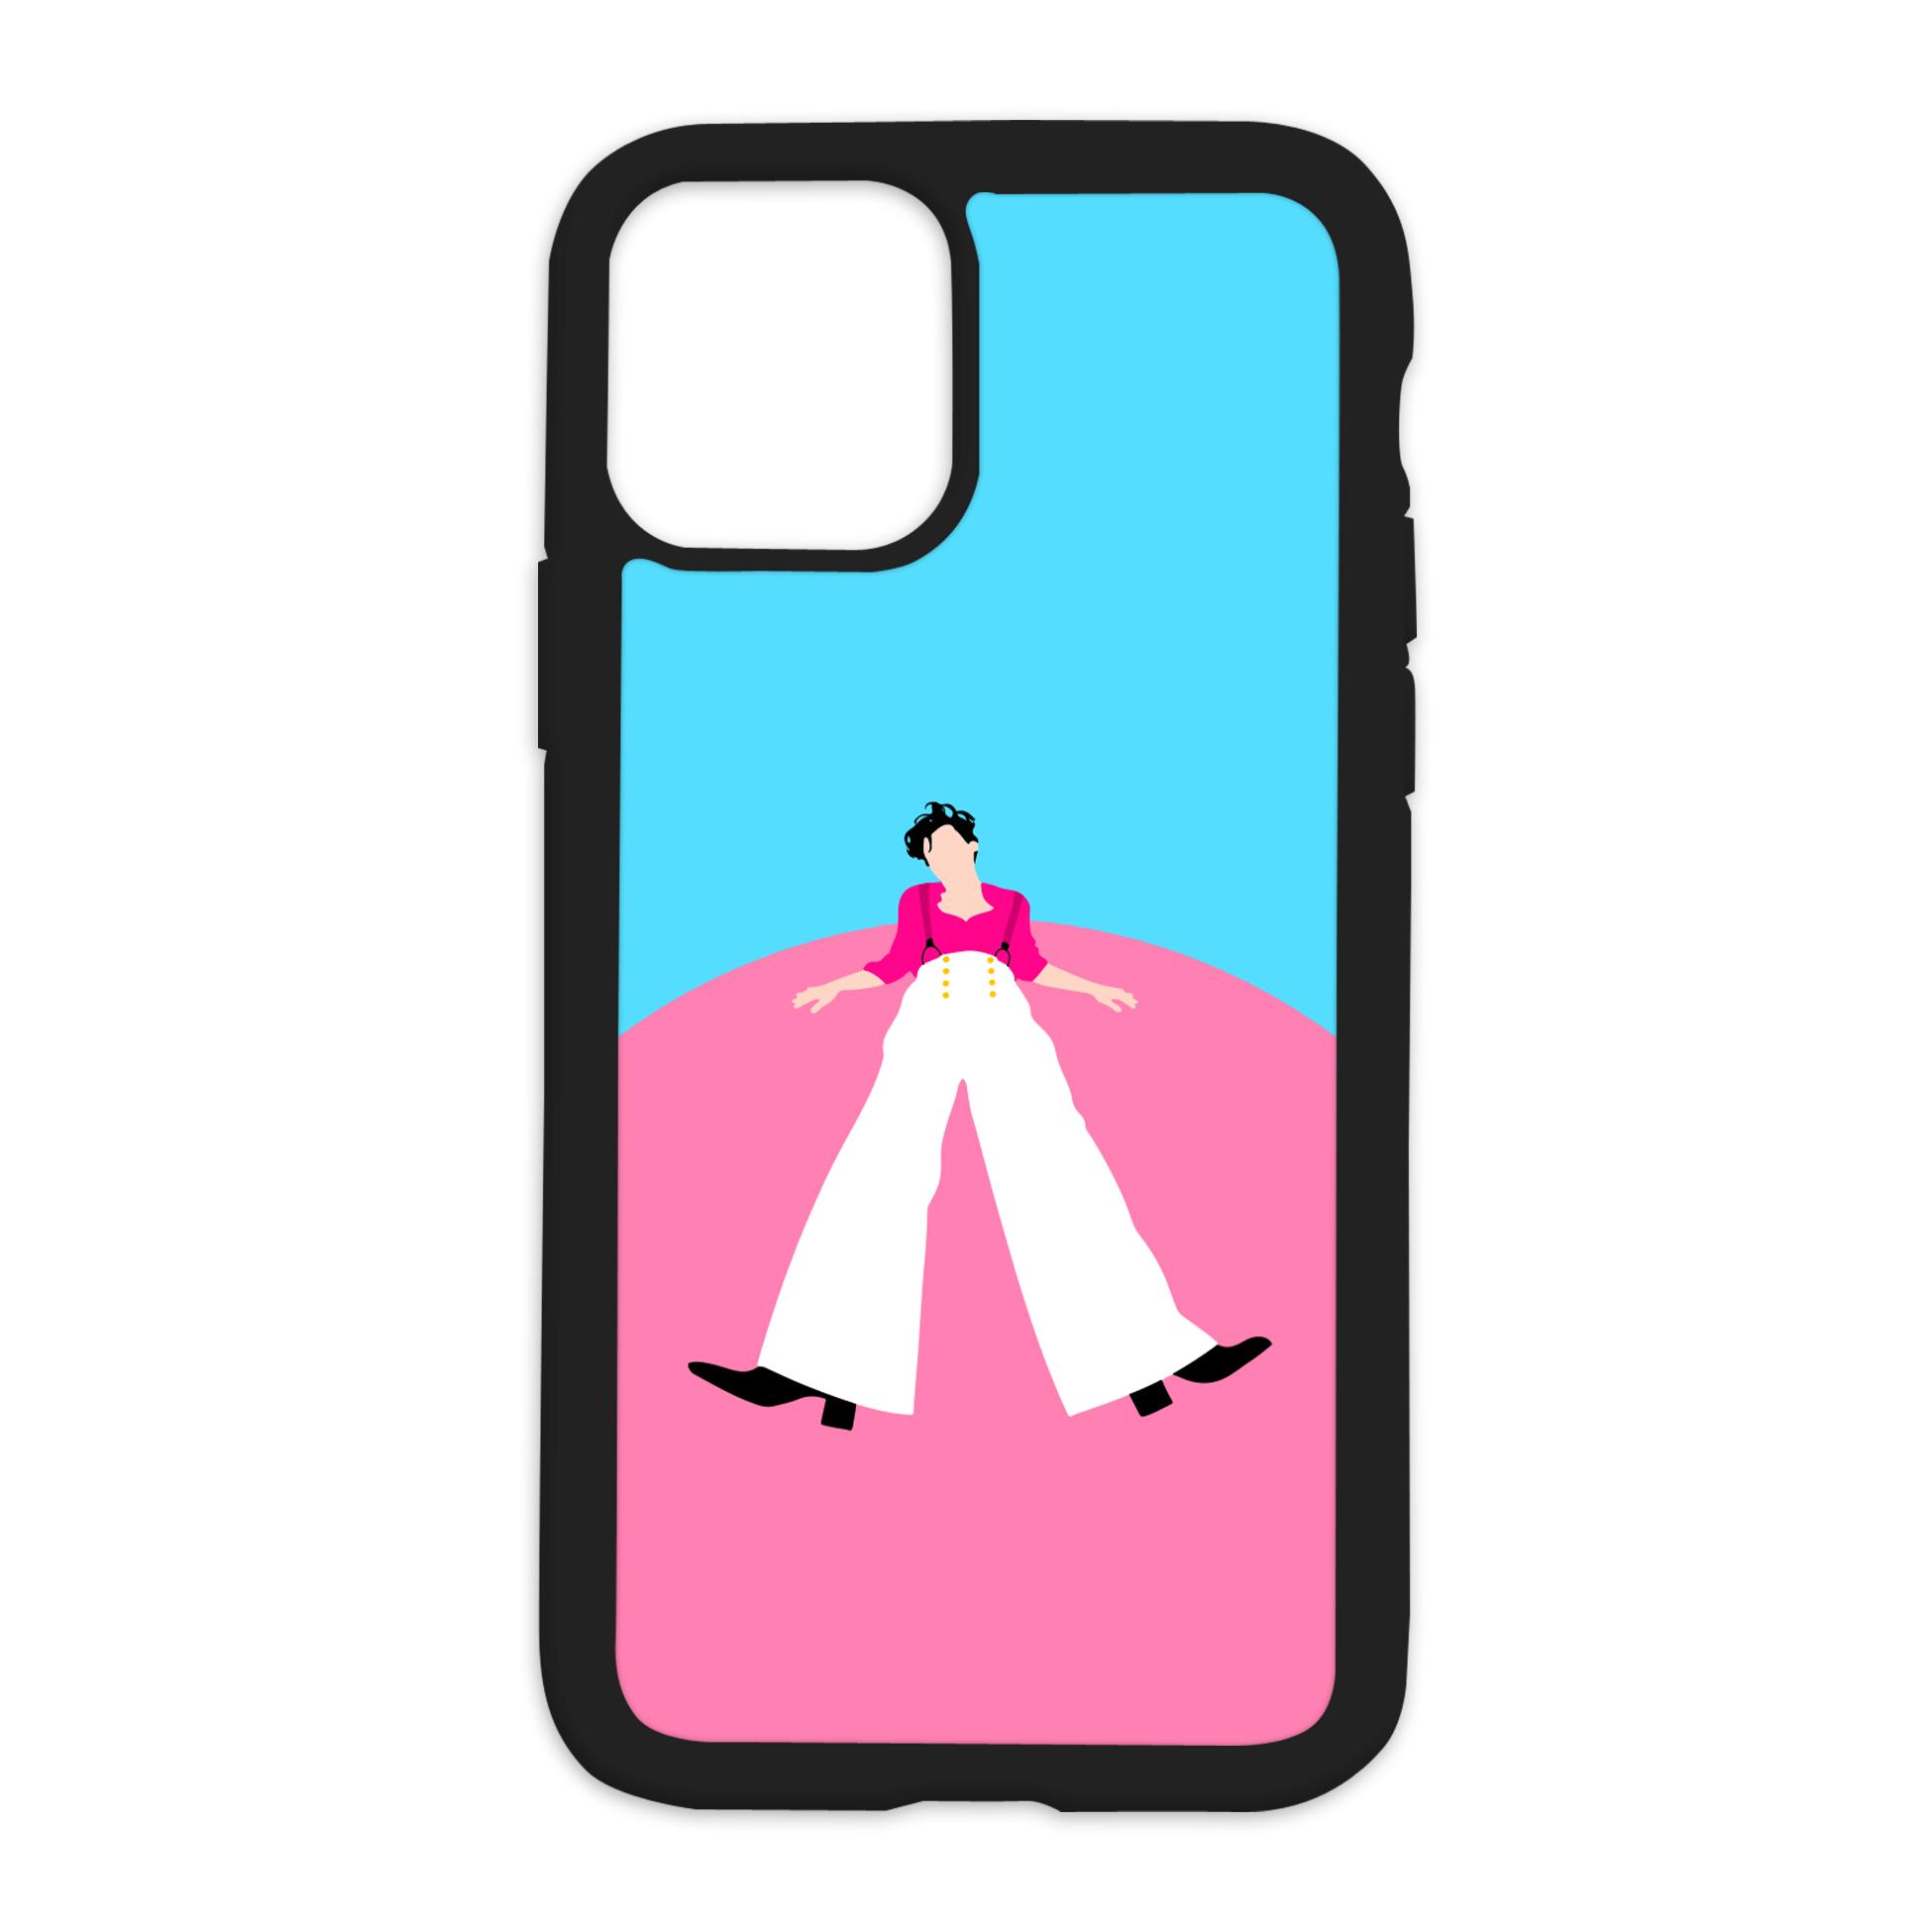 Harry Styles Design On Black Phone Case - 6/6s+